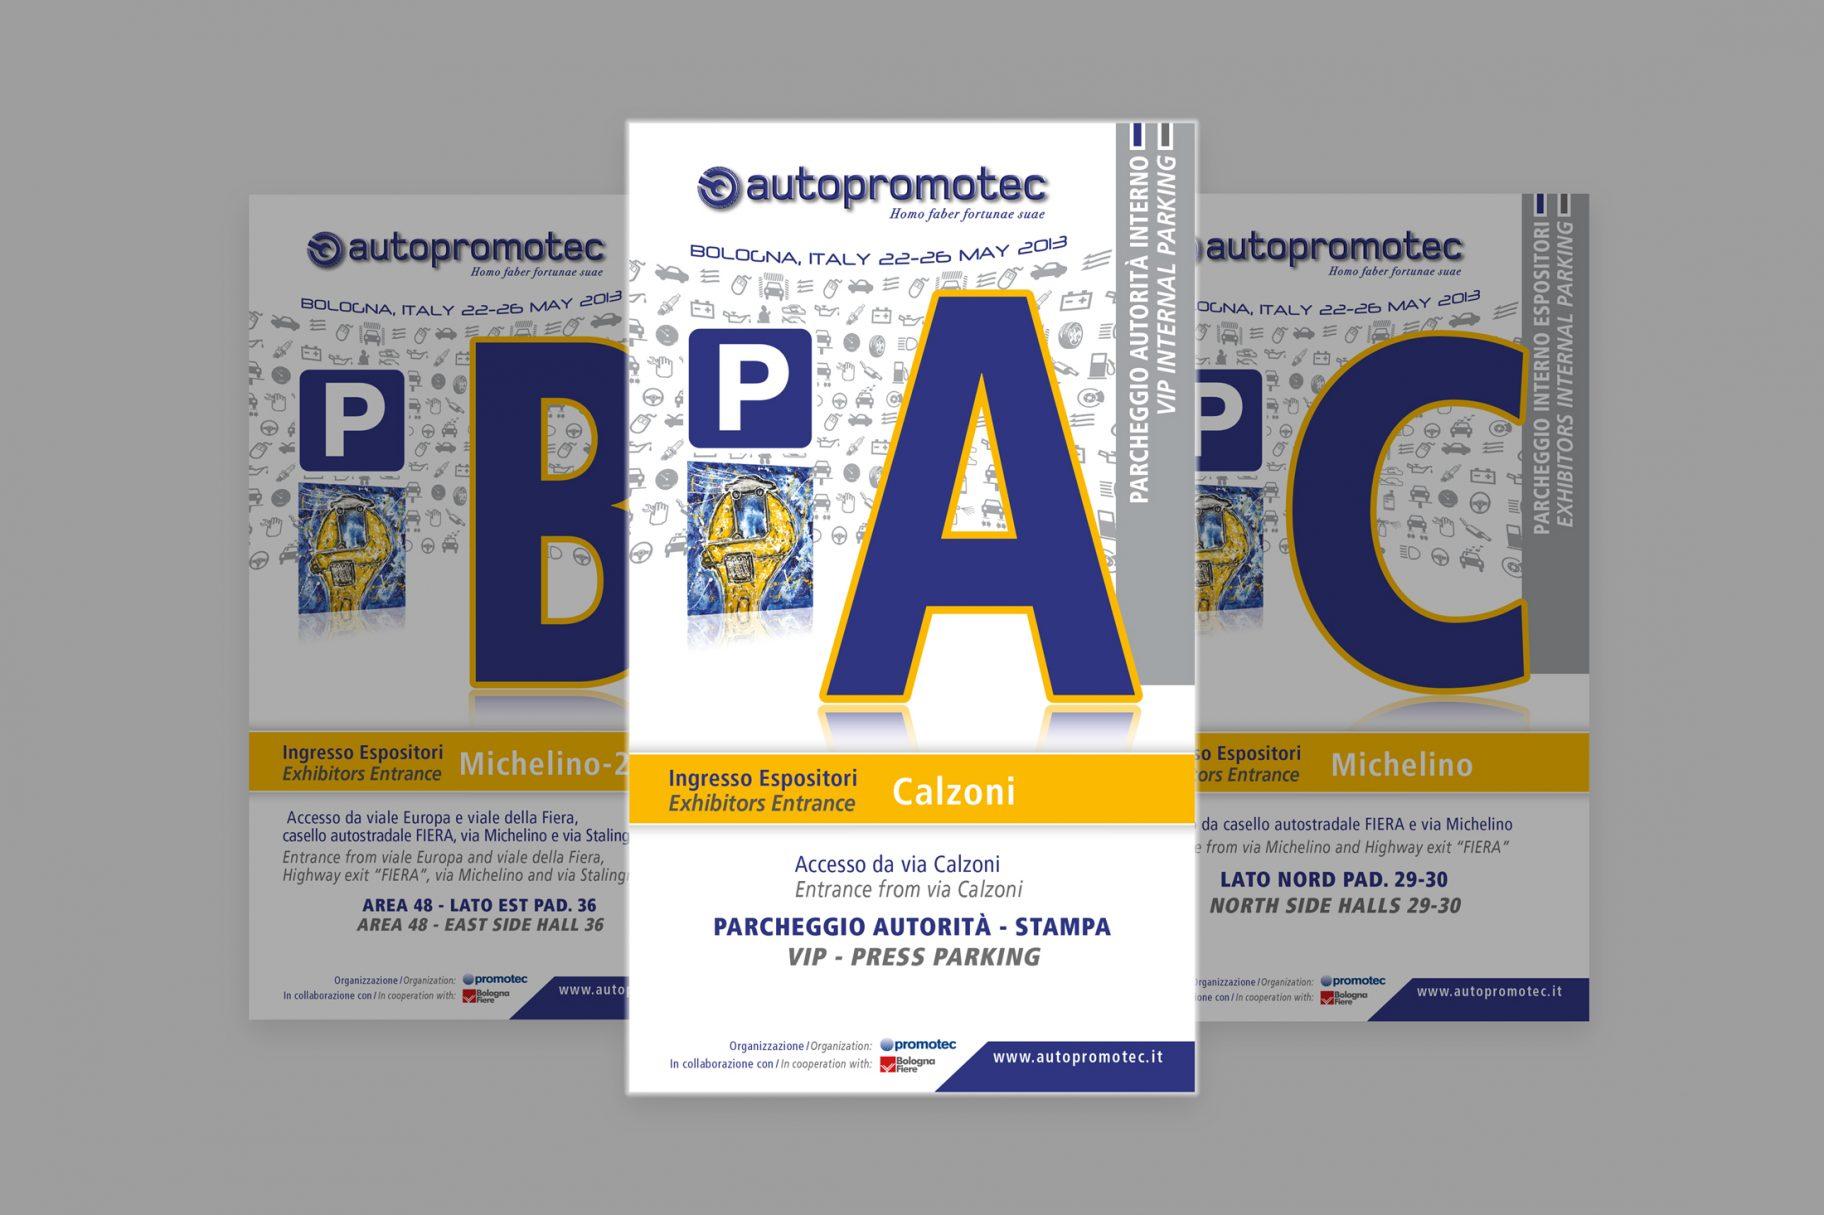 Autopromotec-fiera-2013-pass-parcheggio